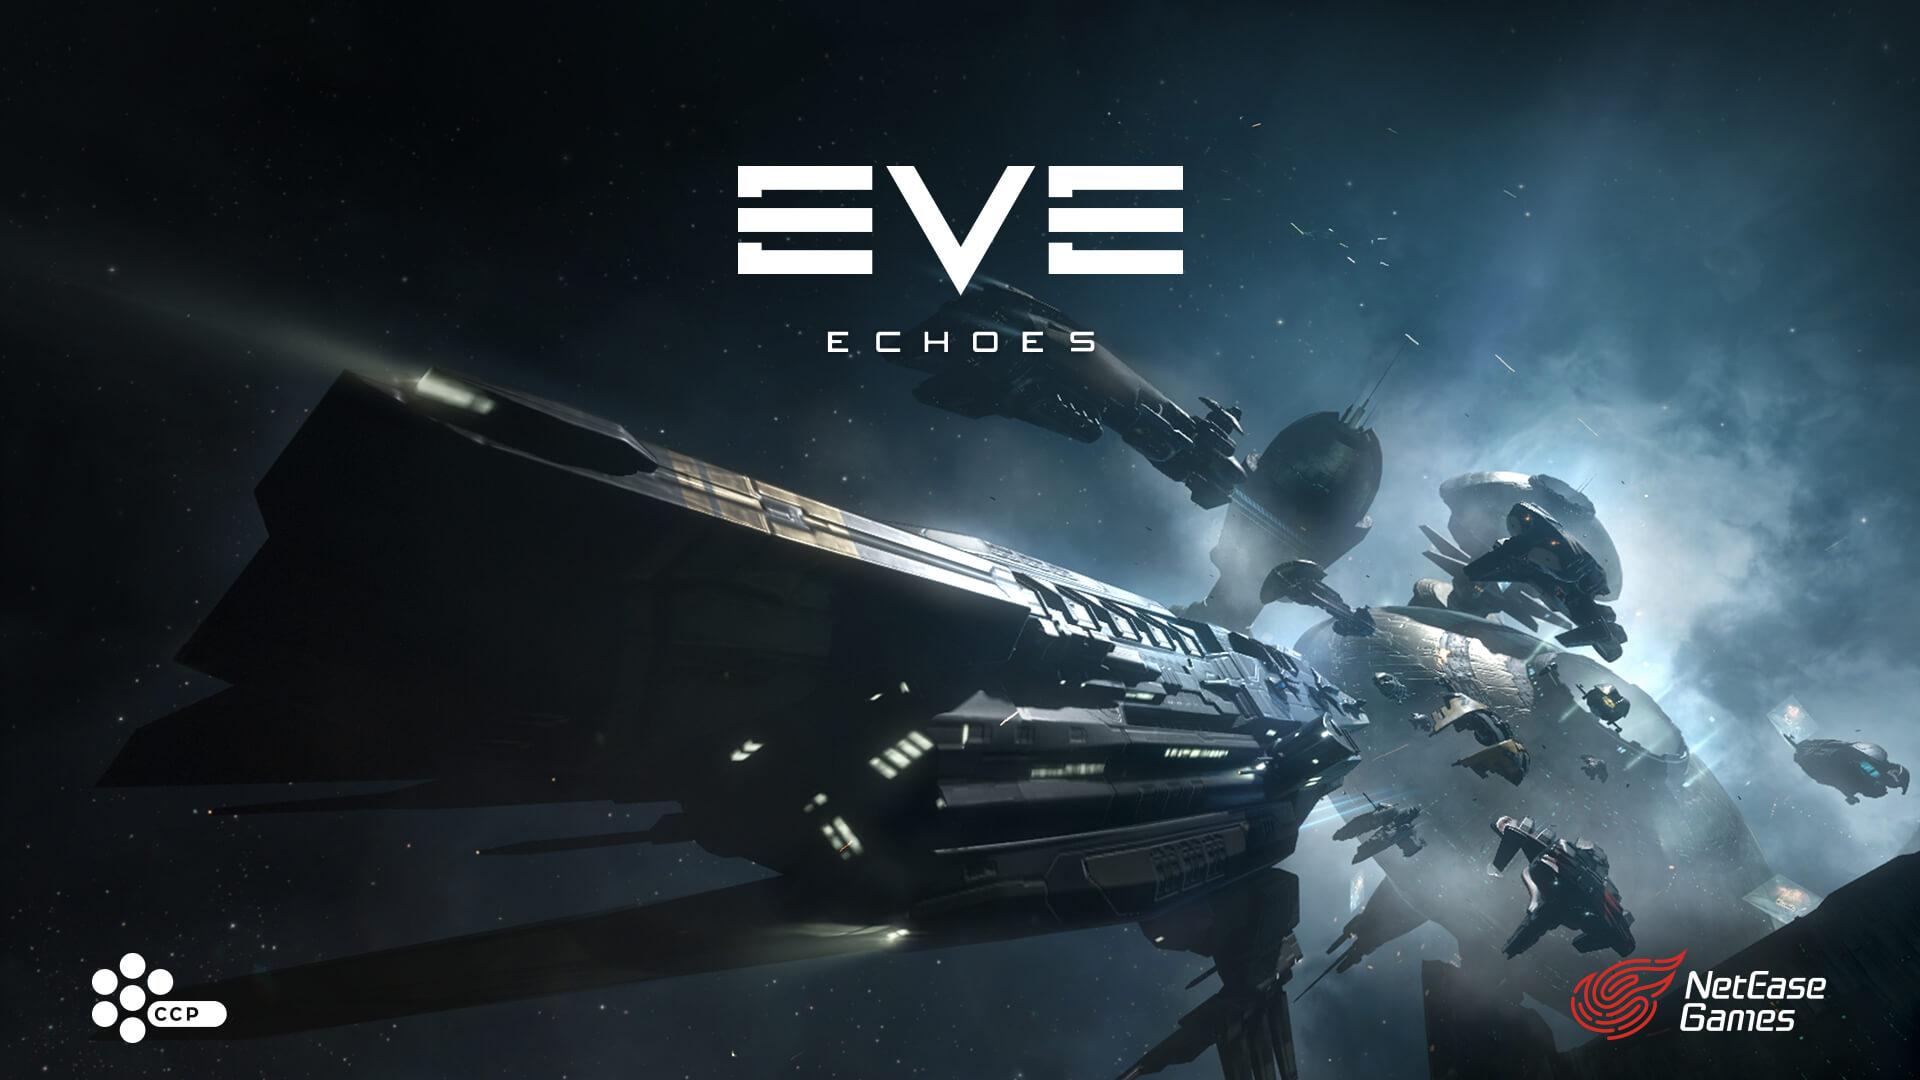 Photo of لعبة EVE Echoes ستكون متاحة كإصدار تجريبي عام في ديسمبر القادم